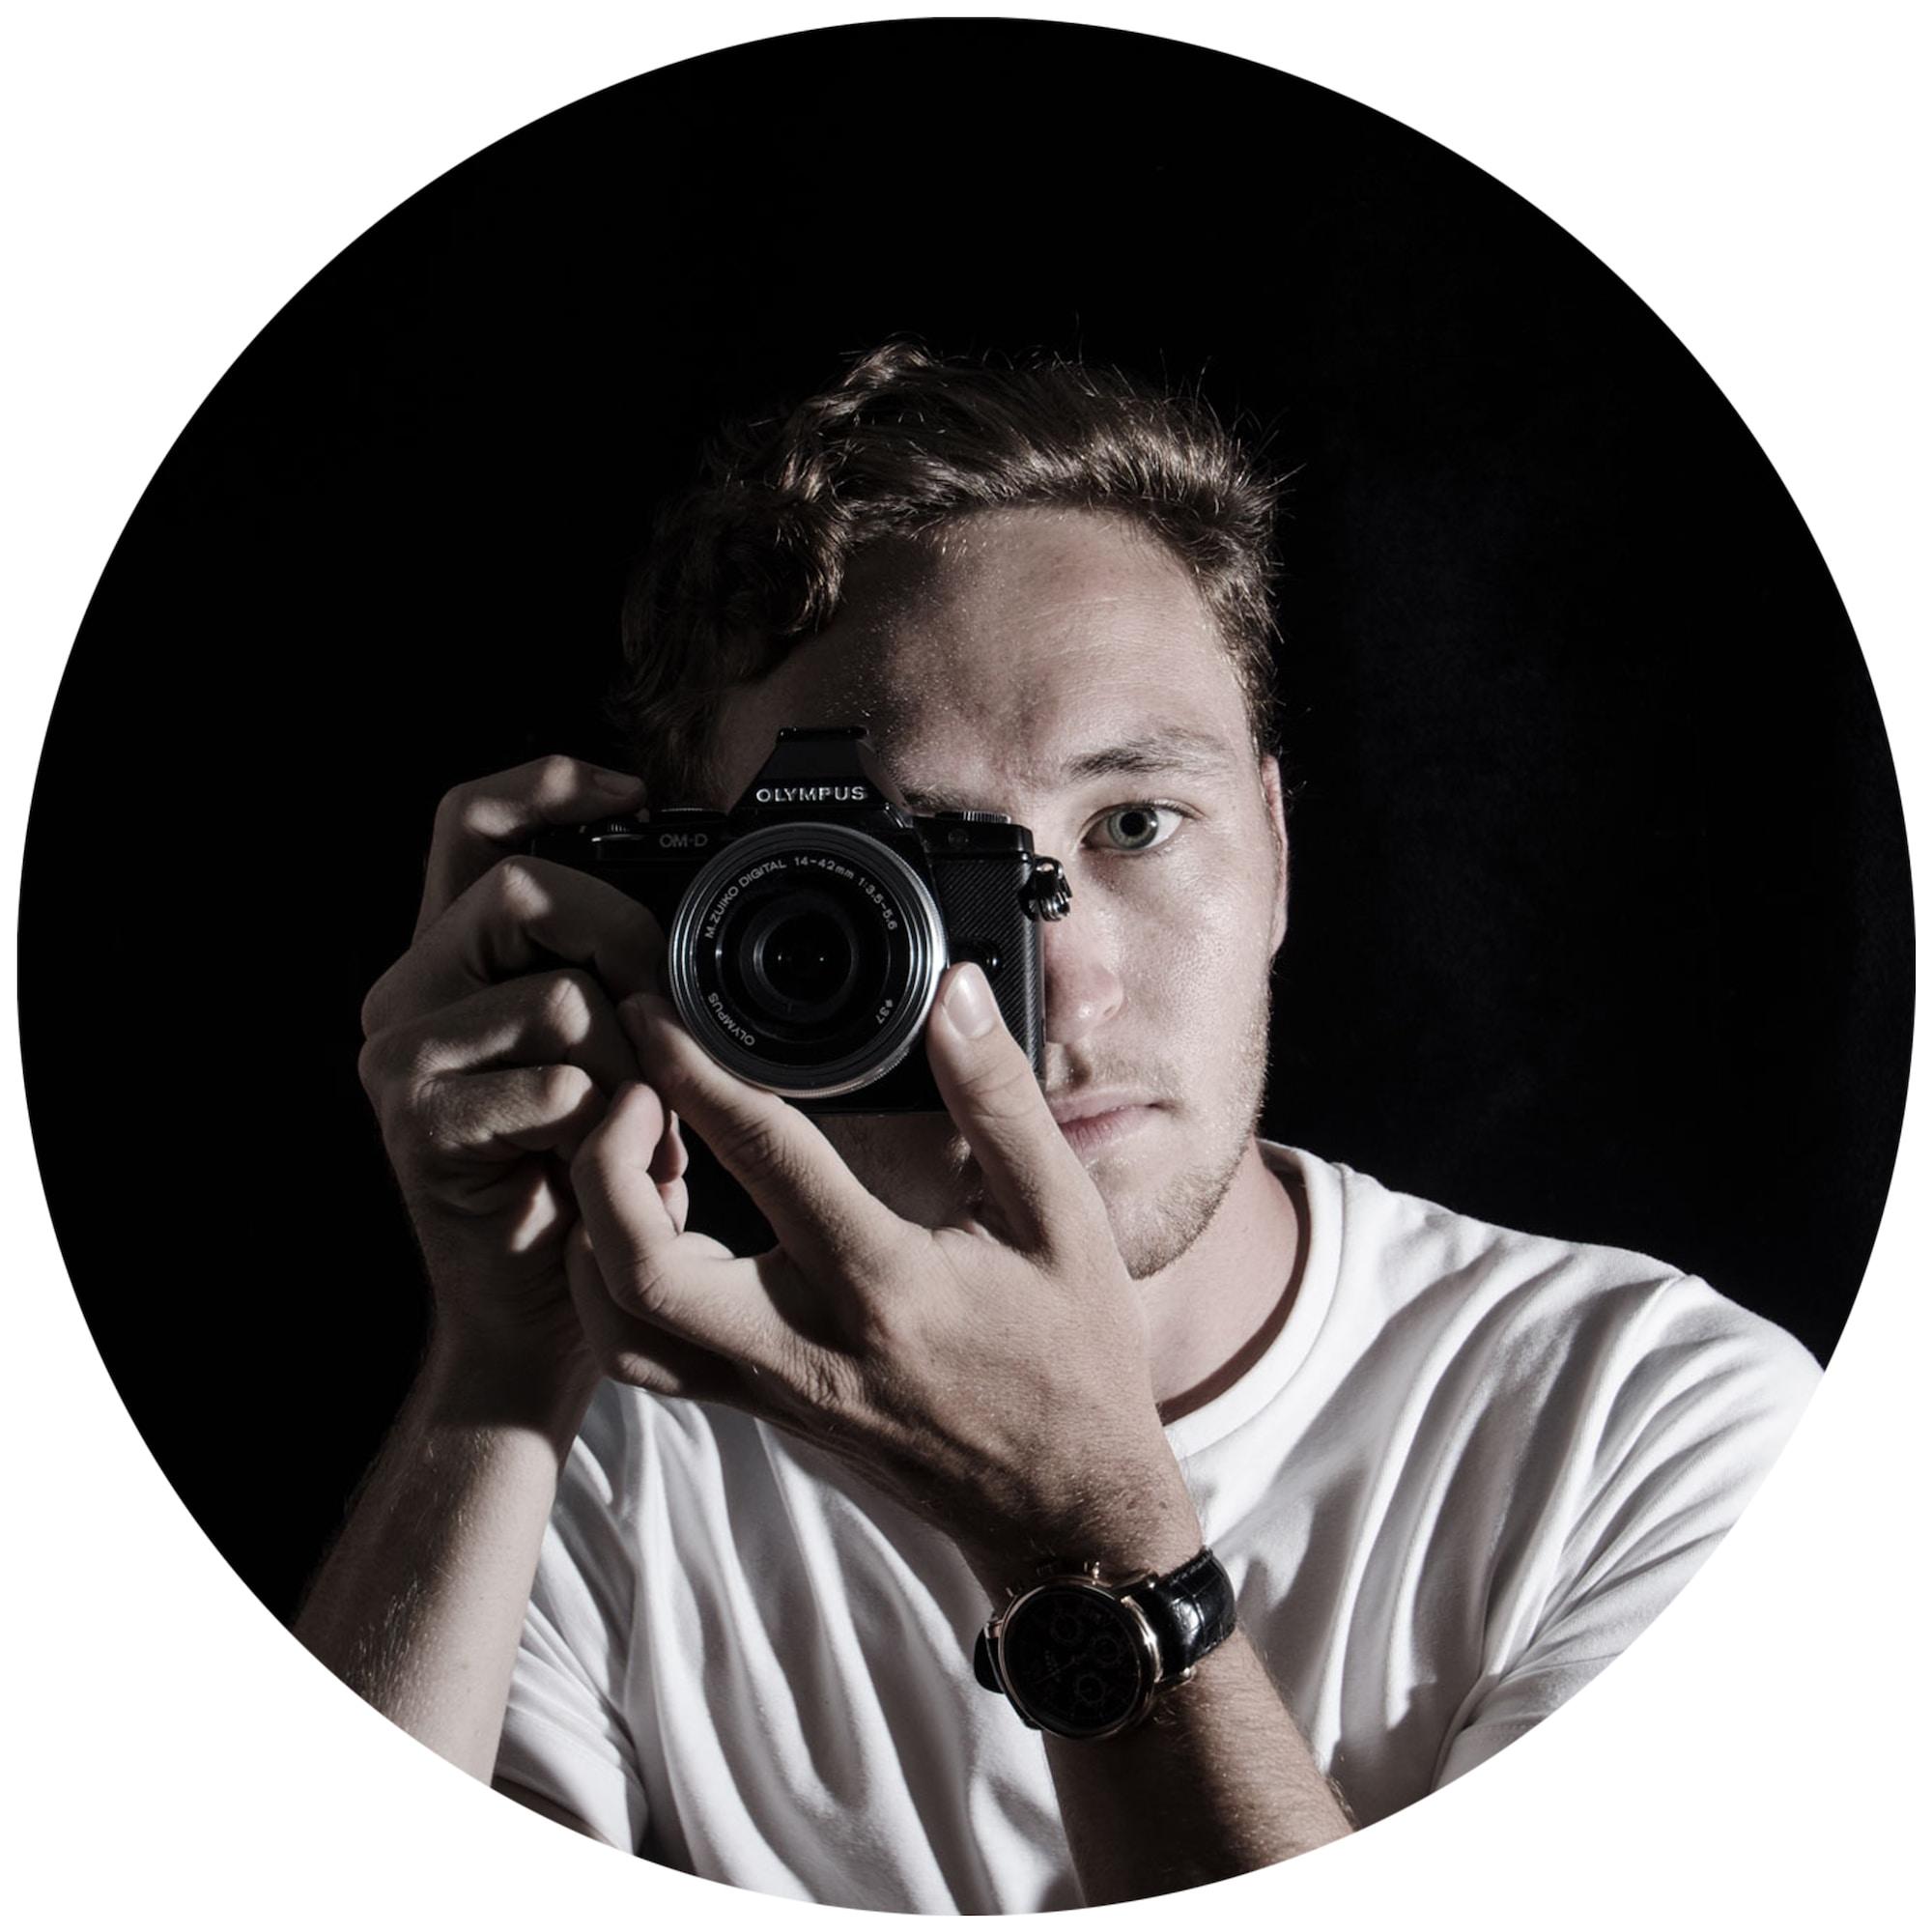 Go to Christopher Czermak's profile